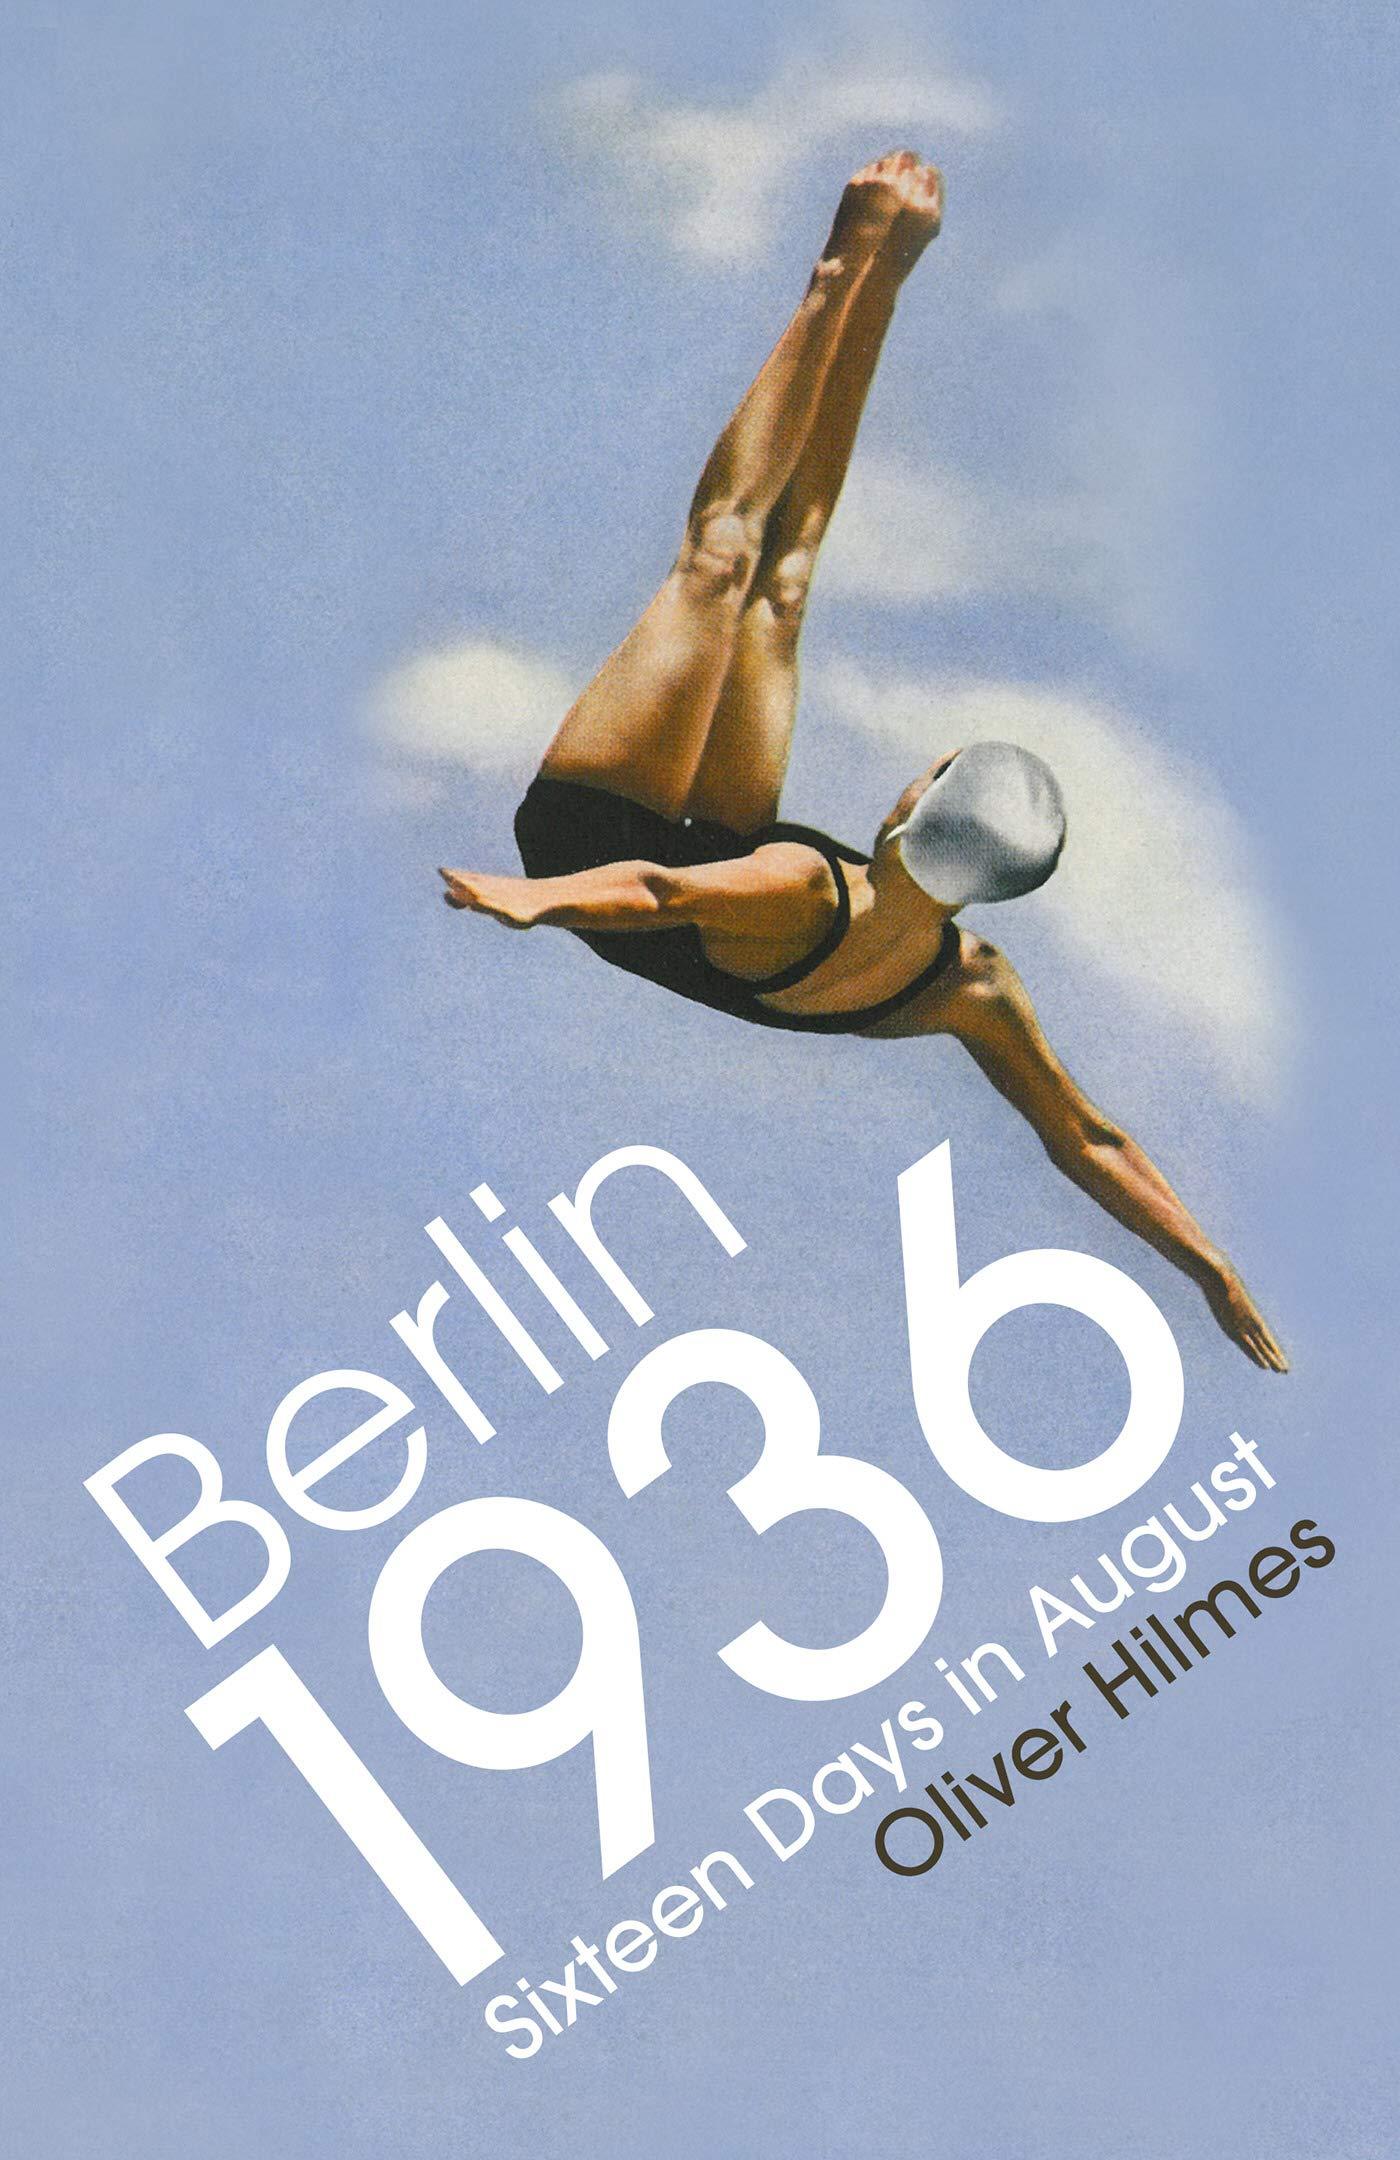 Berlin 1936: Sixteen Days in August